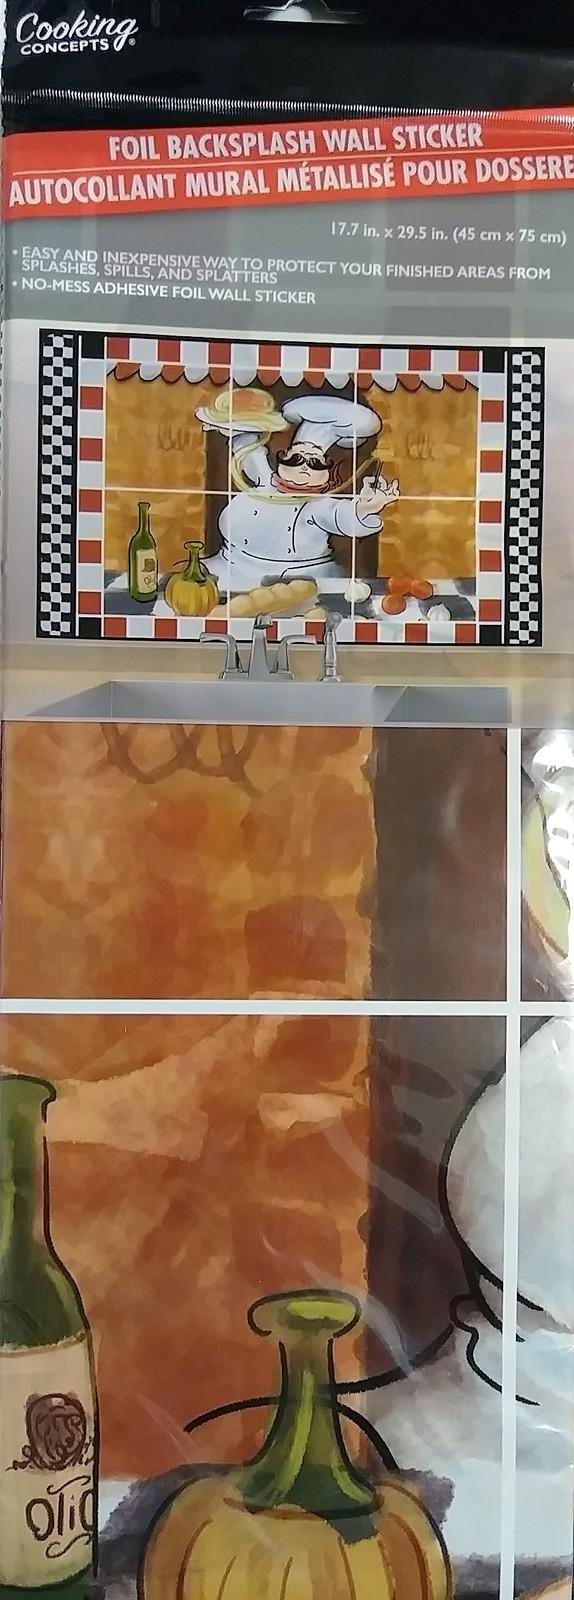 FAT CHEF DECOR BACKSPLASH Foil Wall Sticker Decal 30x18 NEW